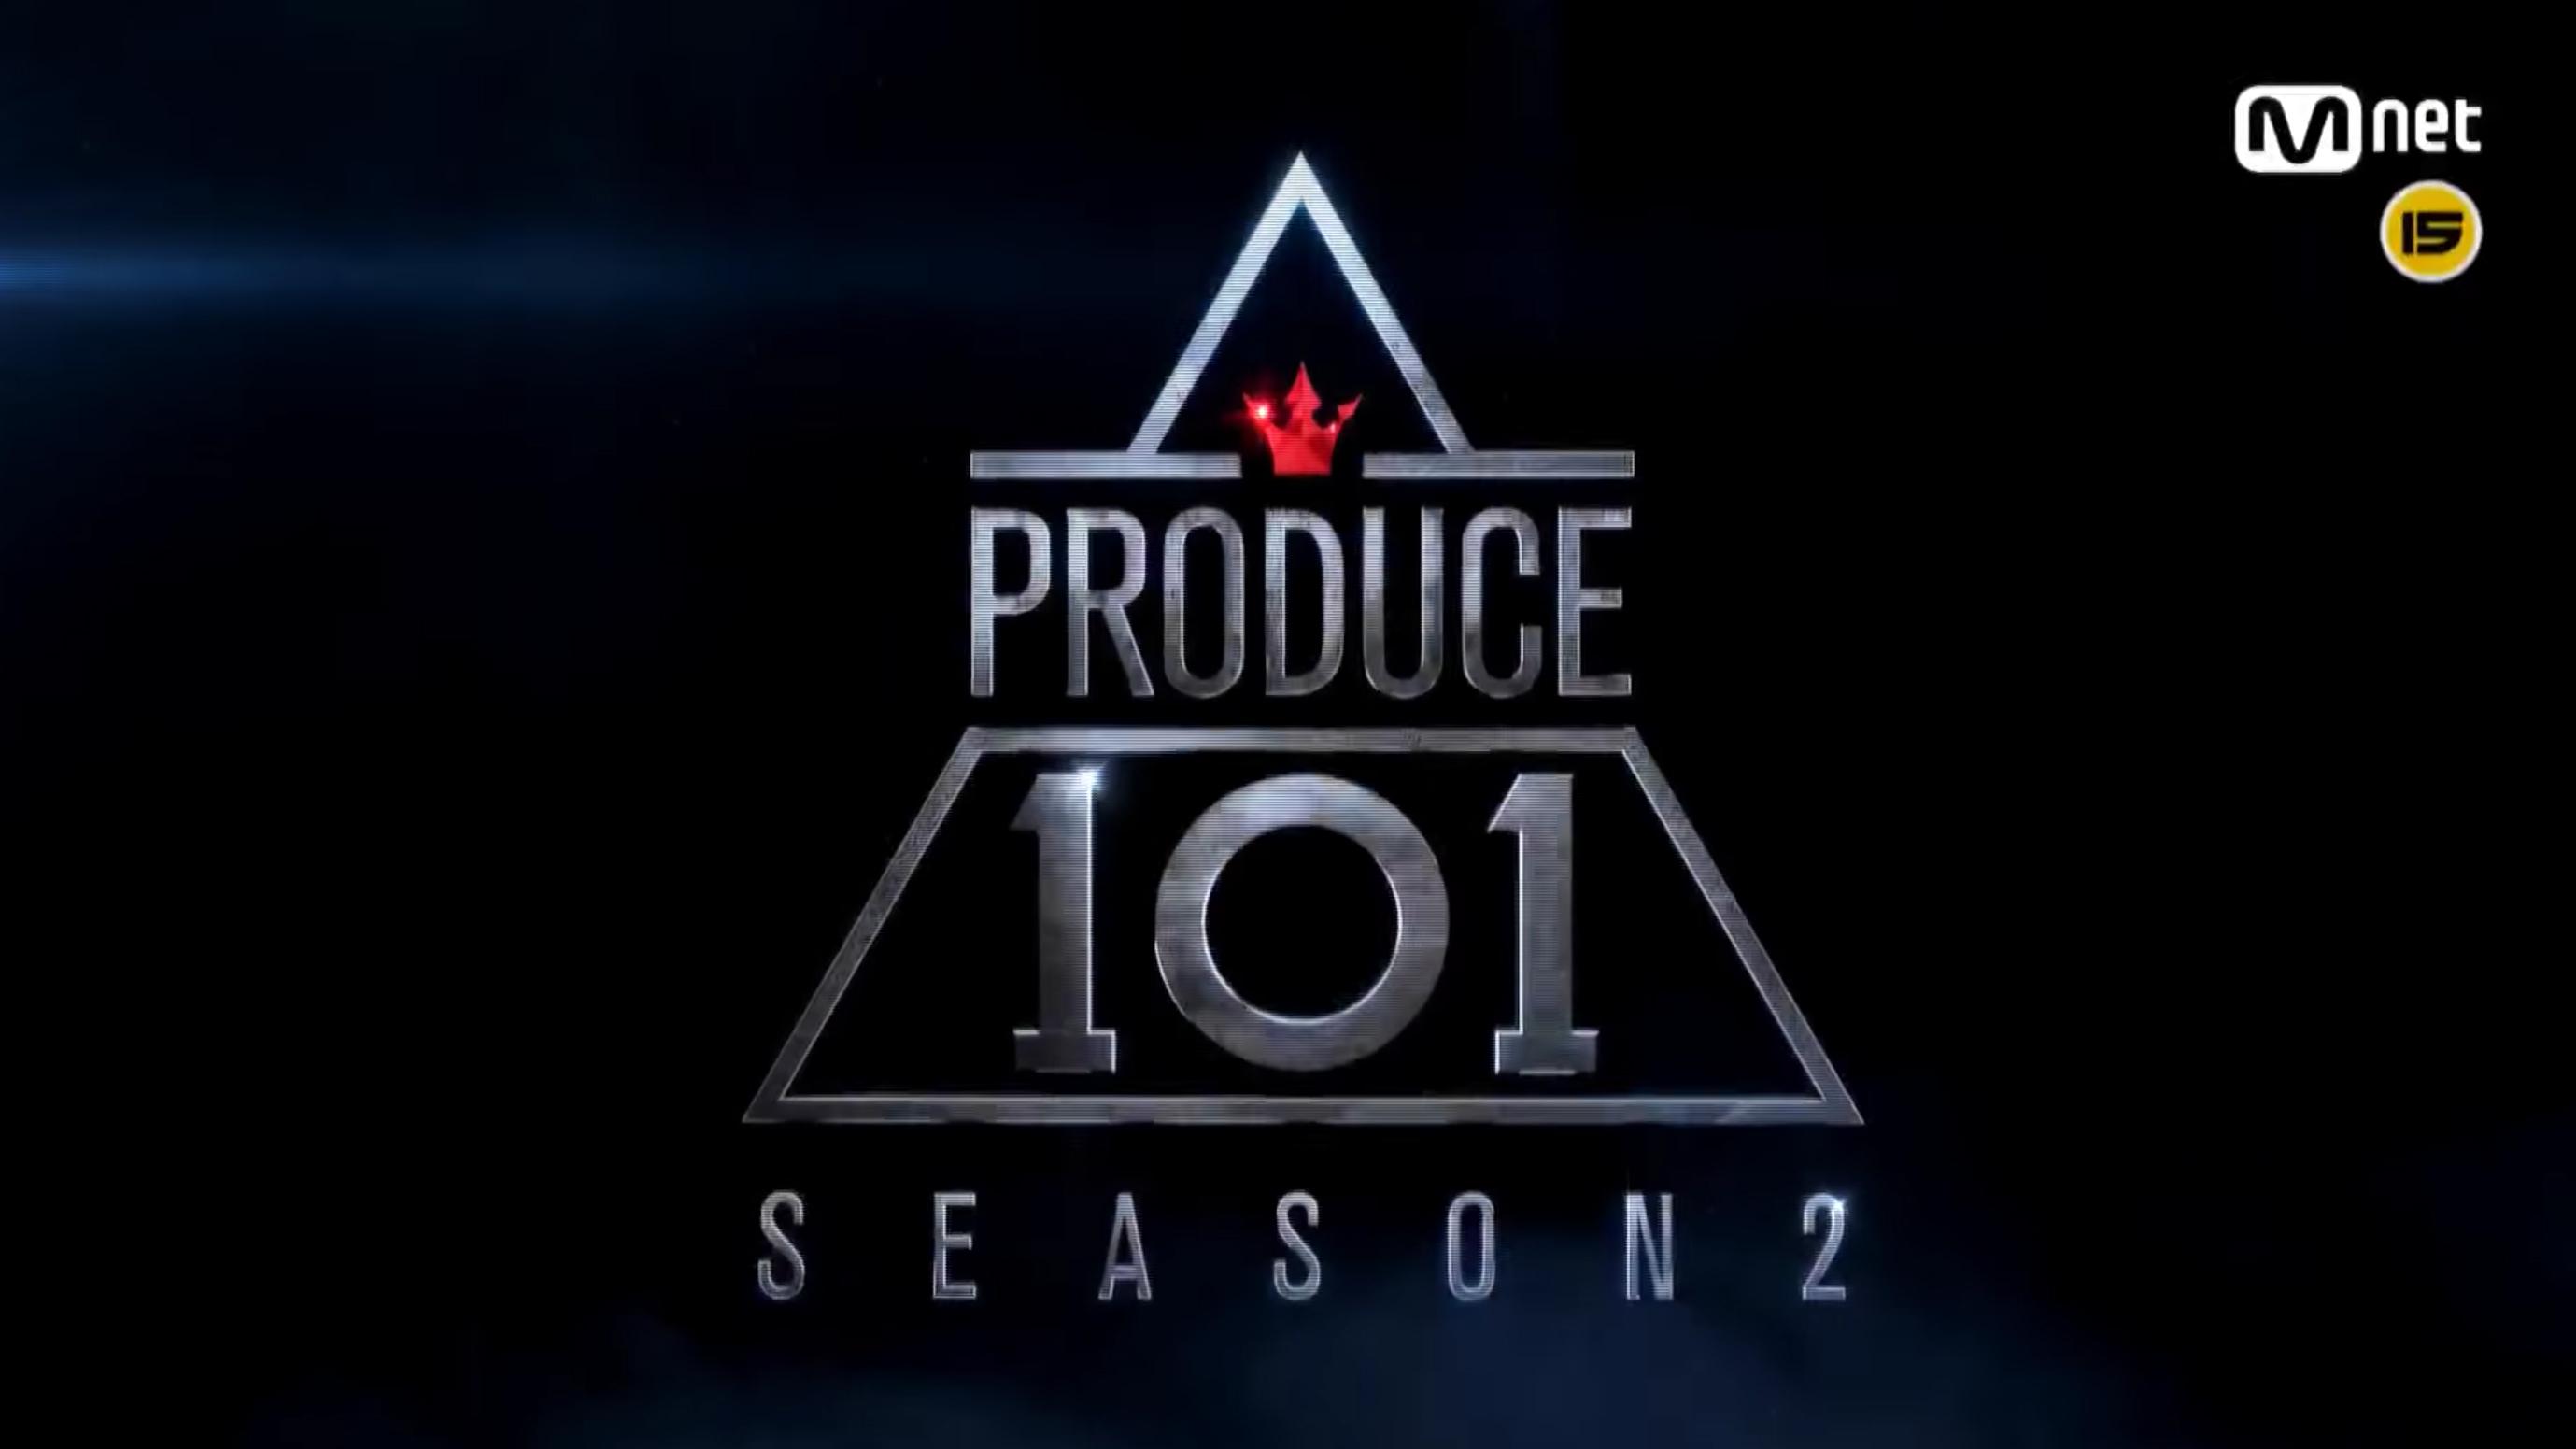 produce-101-s2